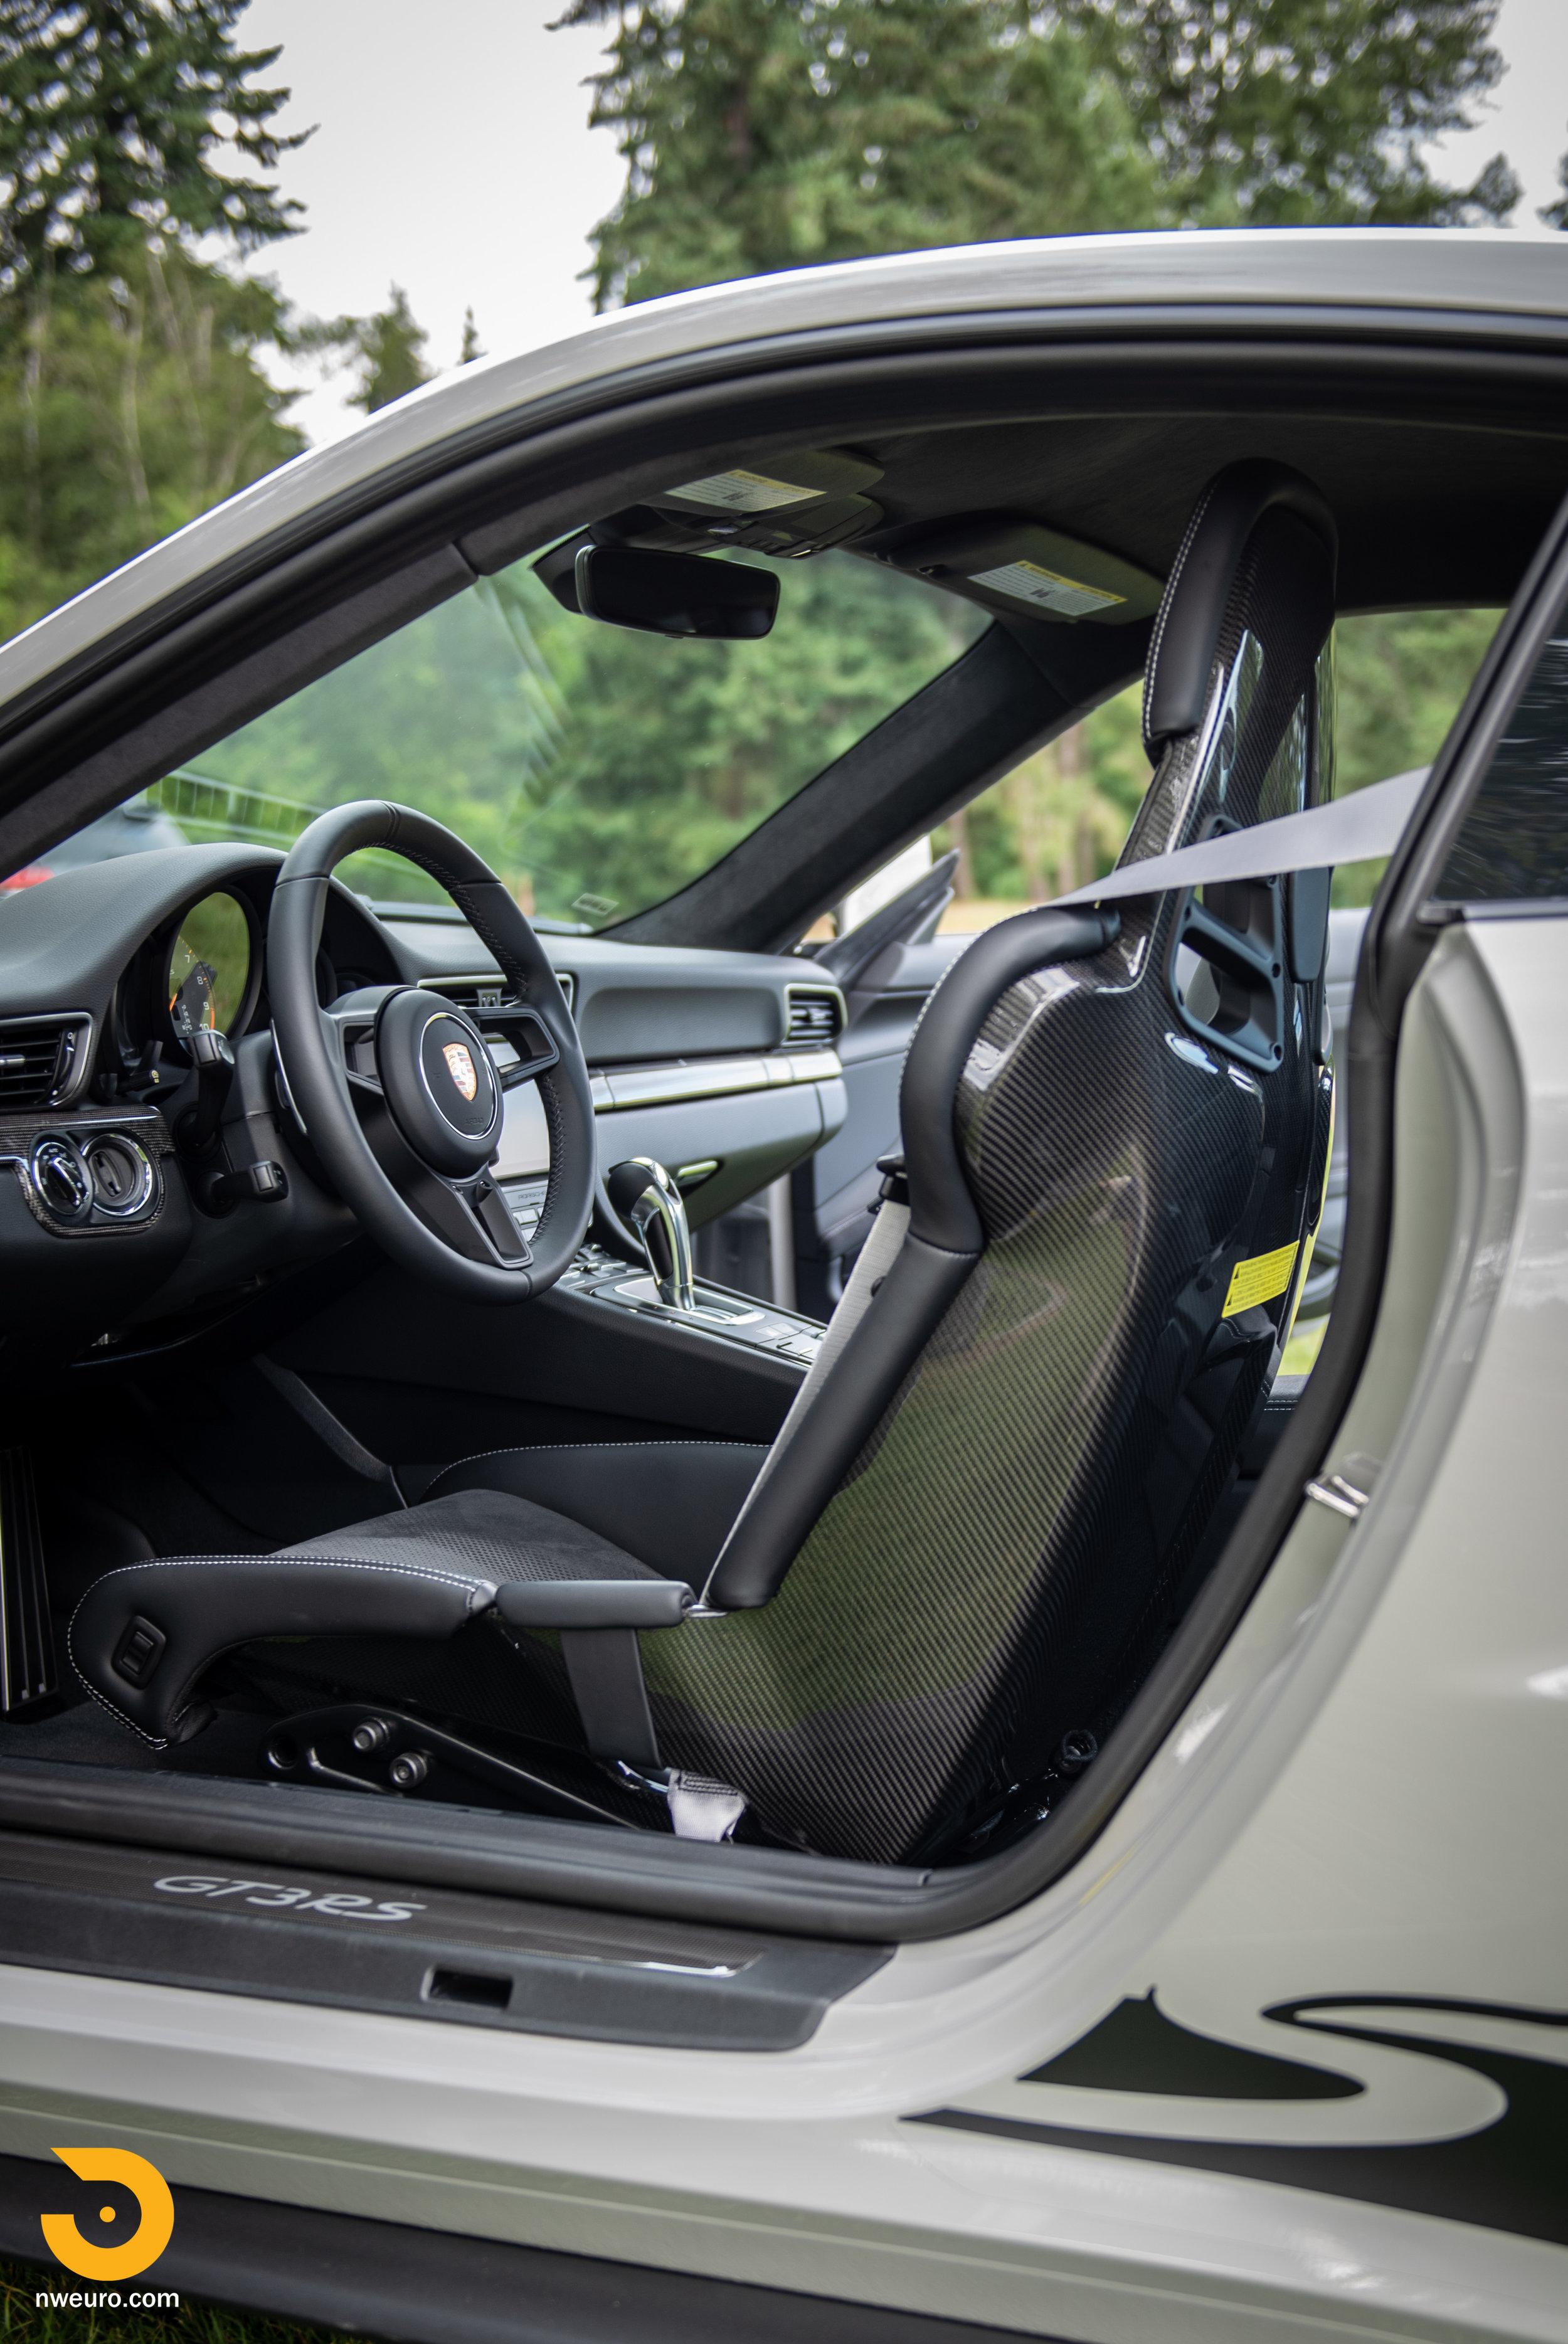 2019 Porsche GT3 RS - Chalk-47.jpg